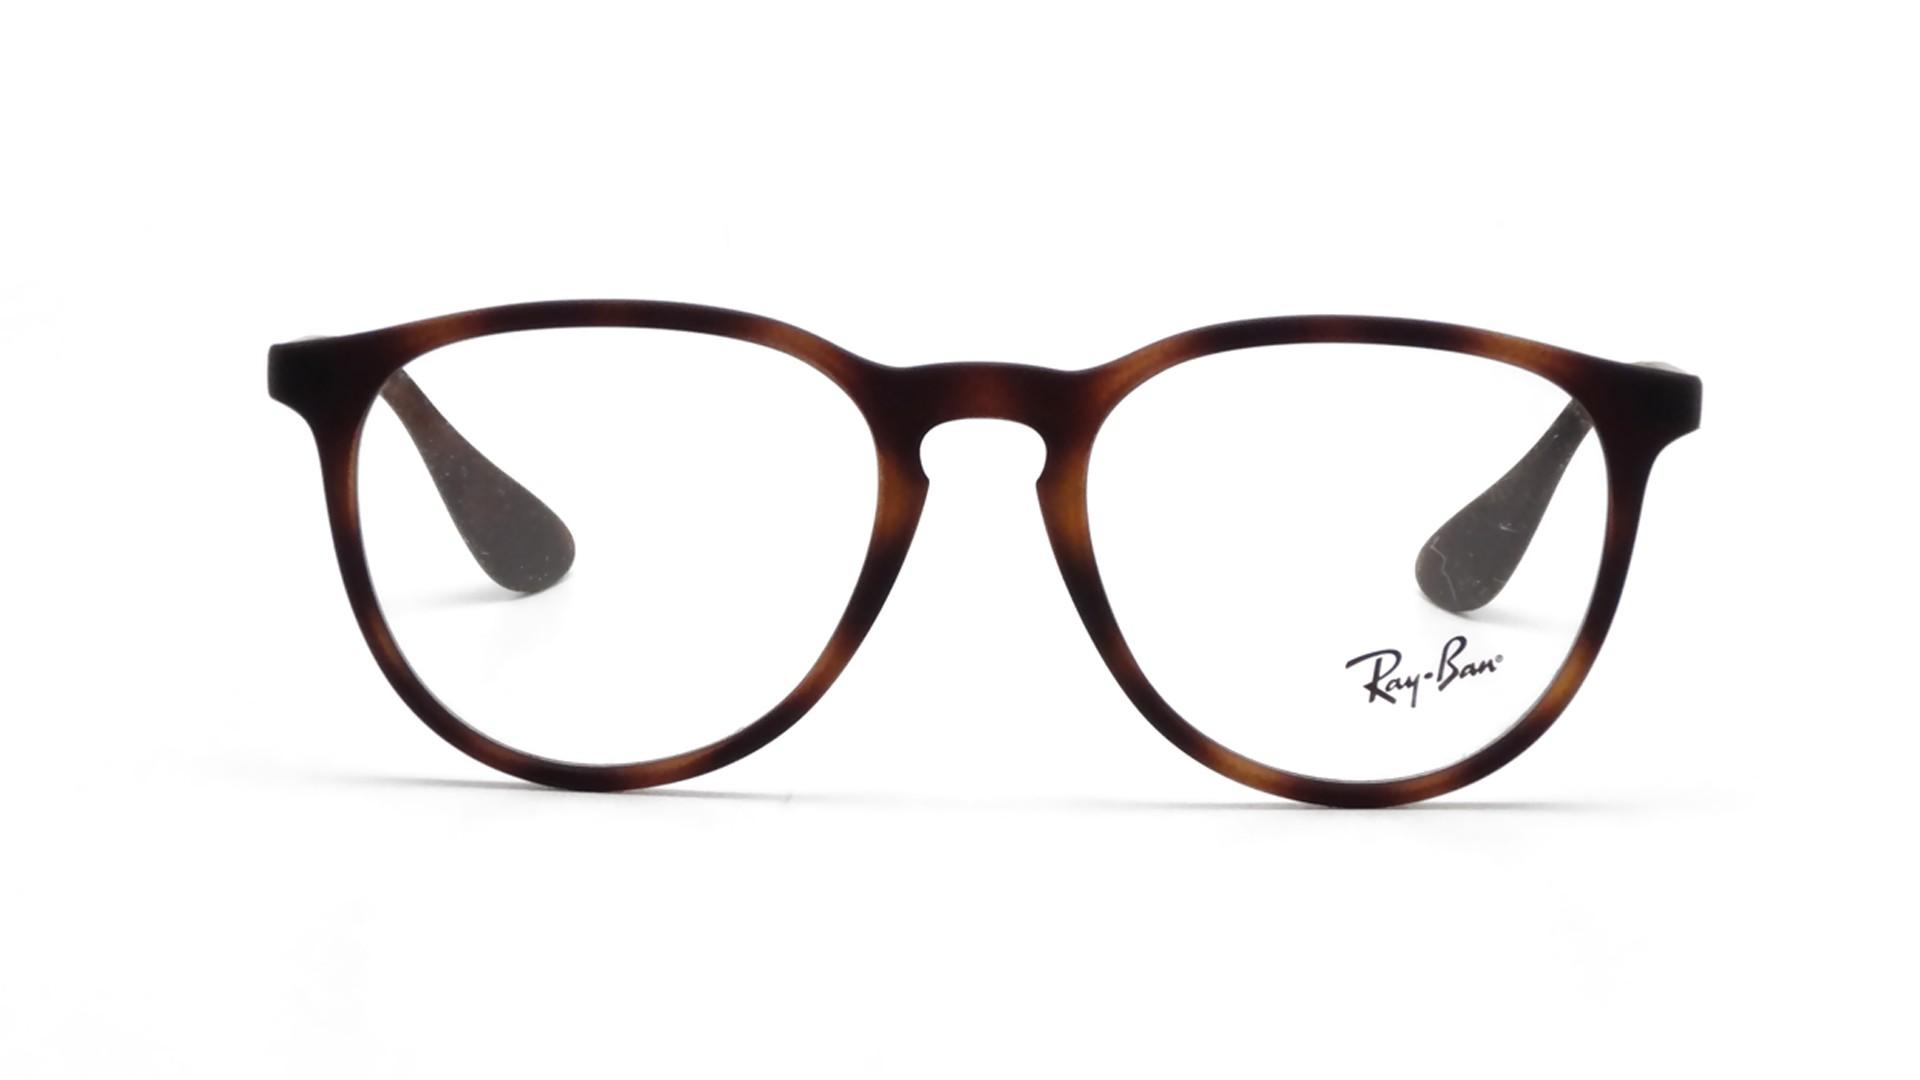 Eyeglass Frame Rep Jobs : should i get a pair of ray ban prescription eyeglasses ...